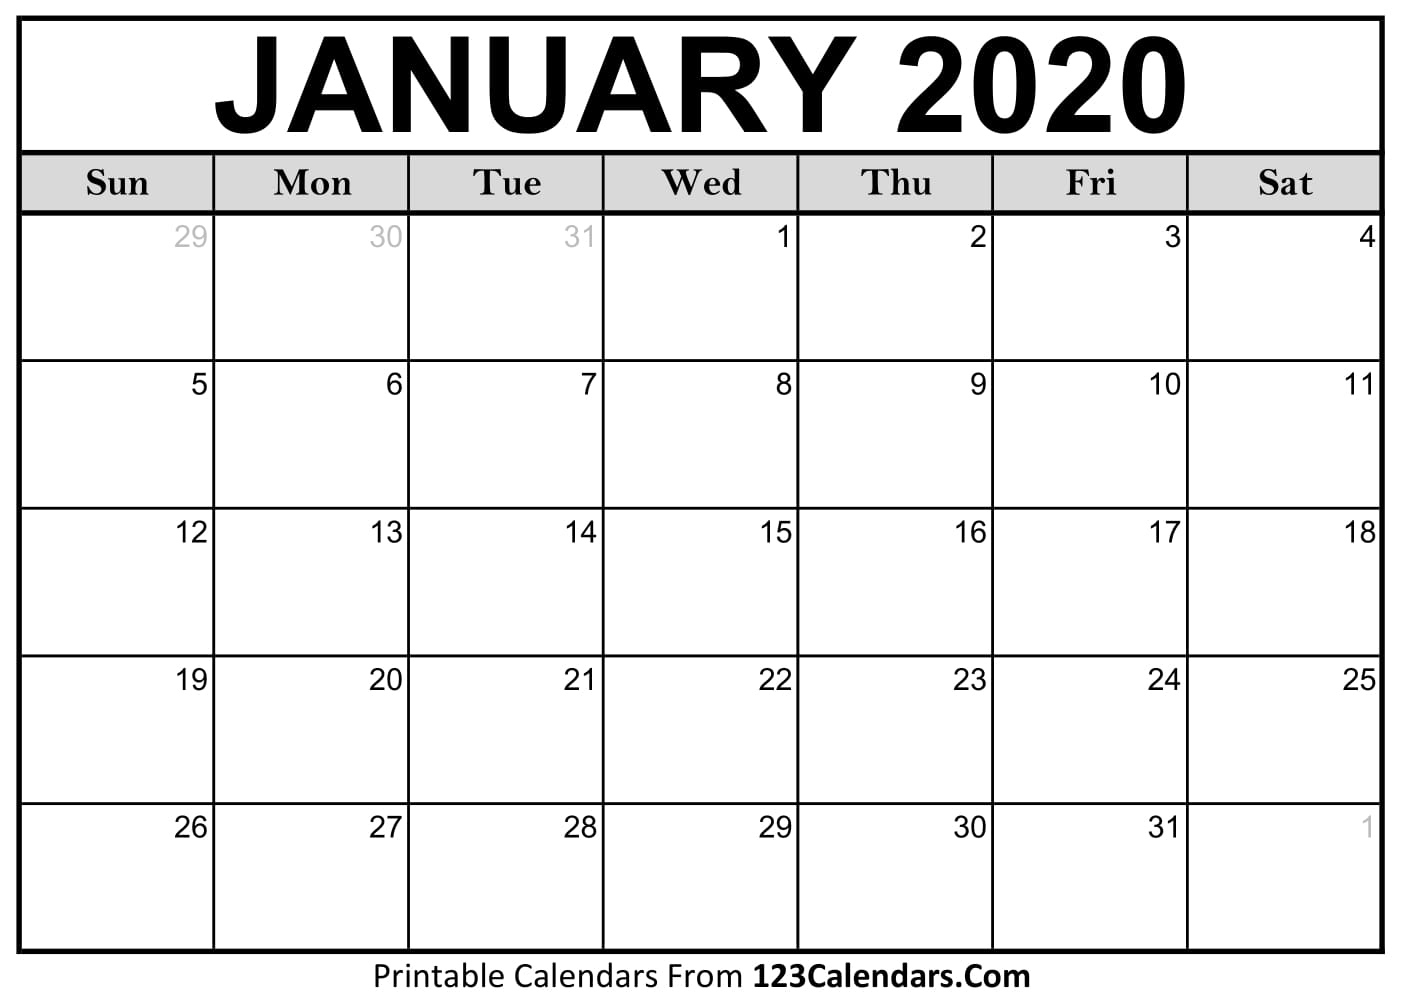 Free Printable Calendar | 123Calendars Remarkable 2020 Blank Printable Monthly Template